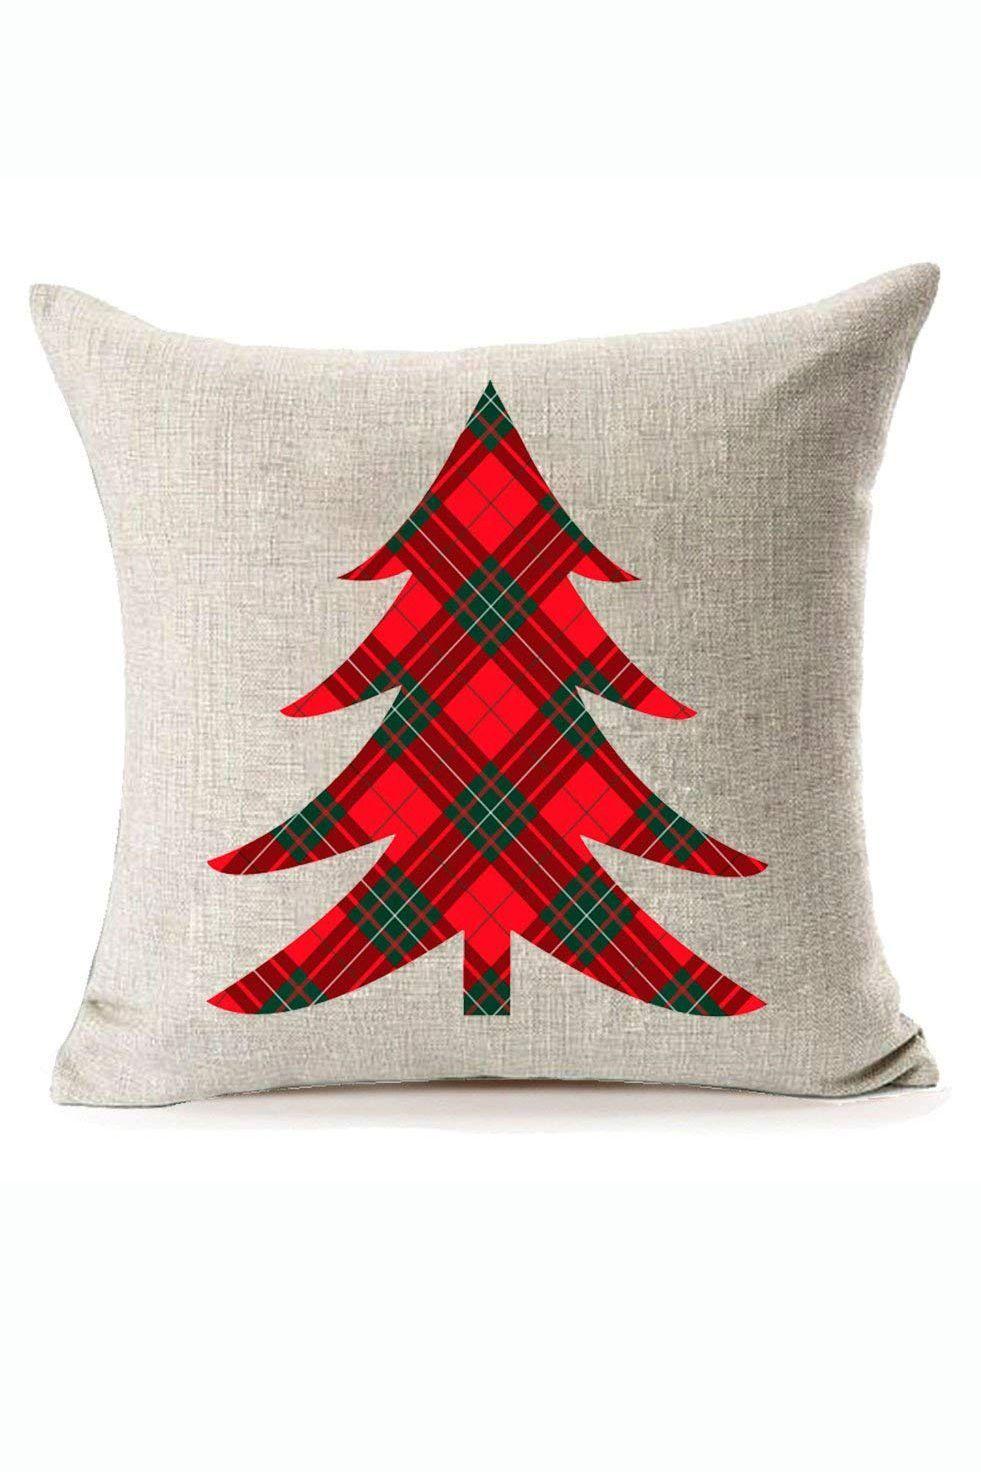 Plaid Christmas Tree Pillow Cover